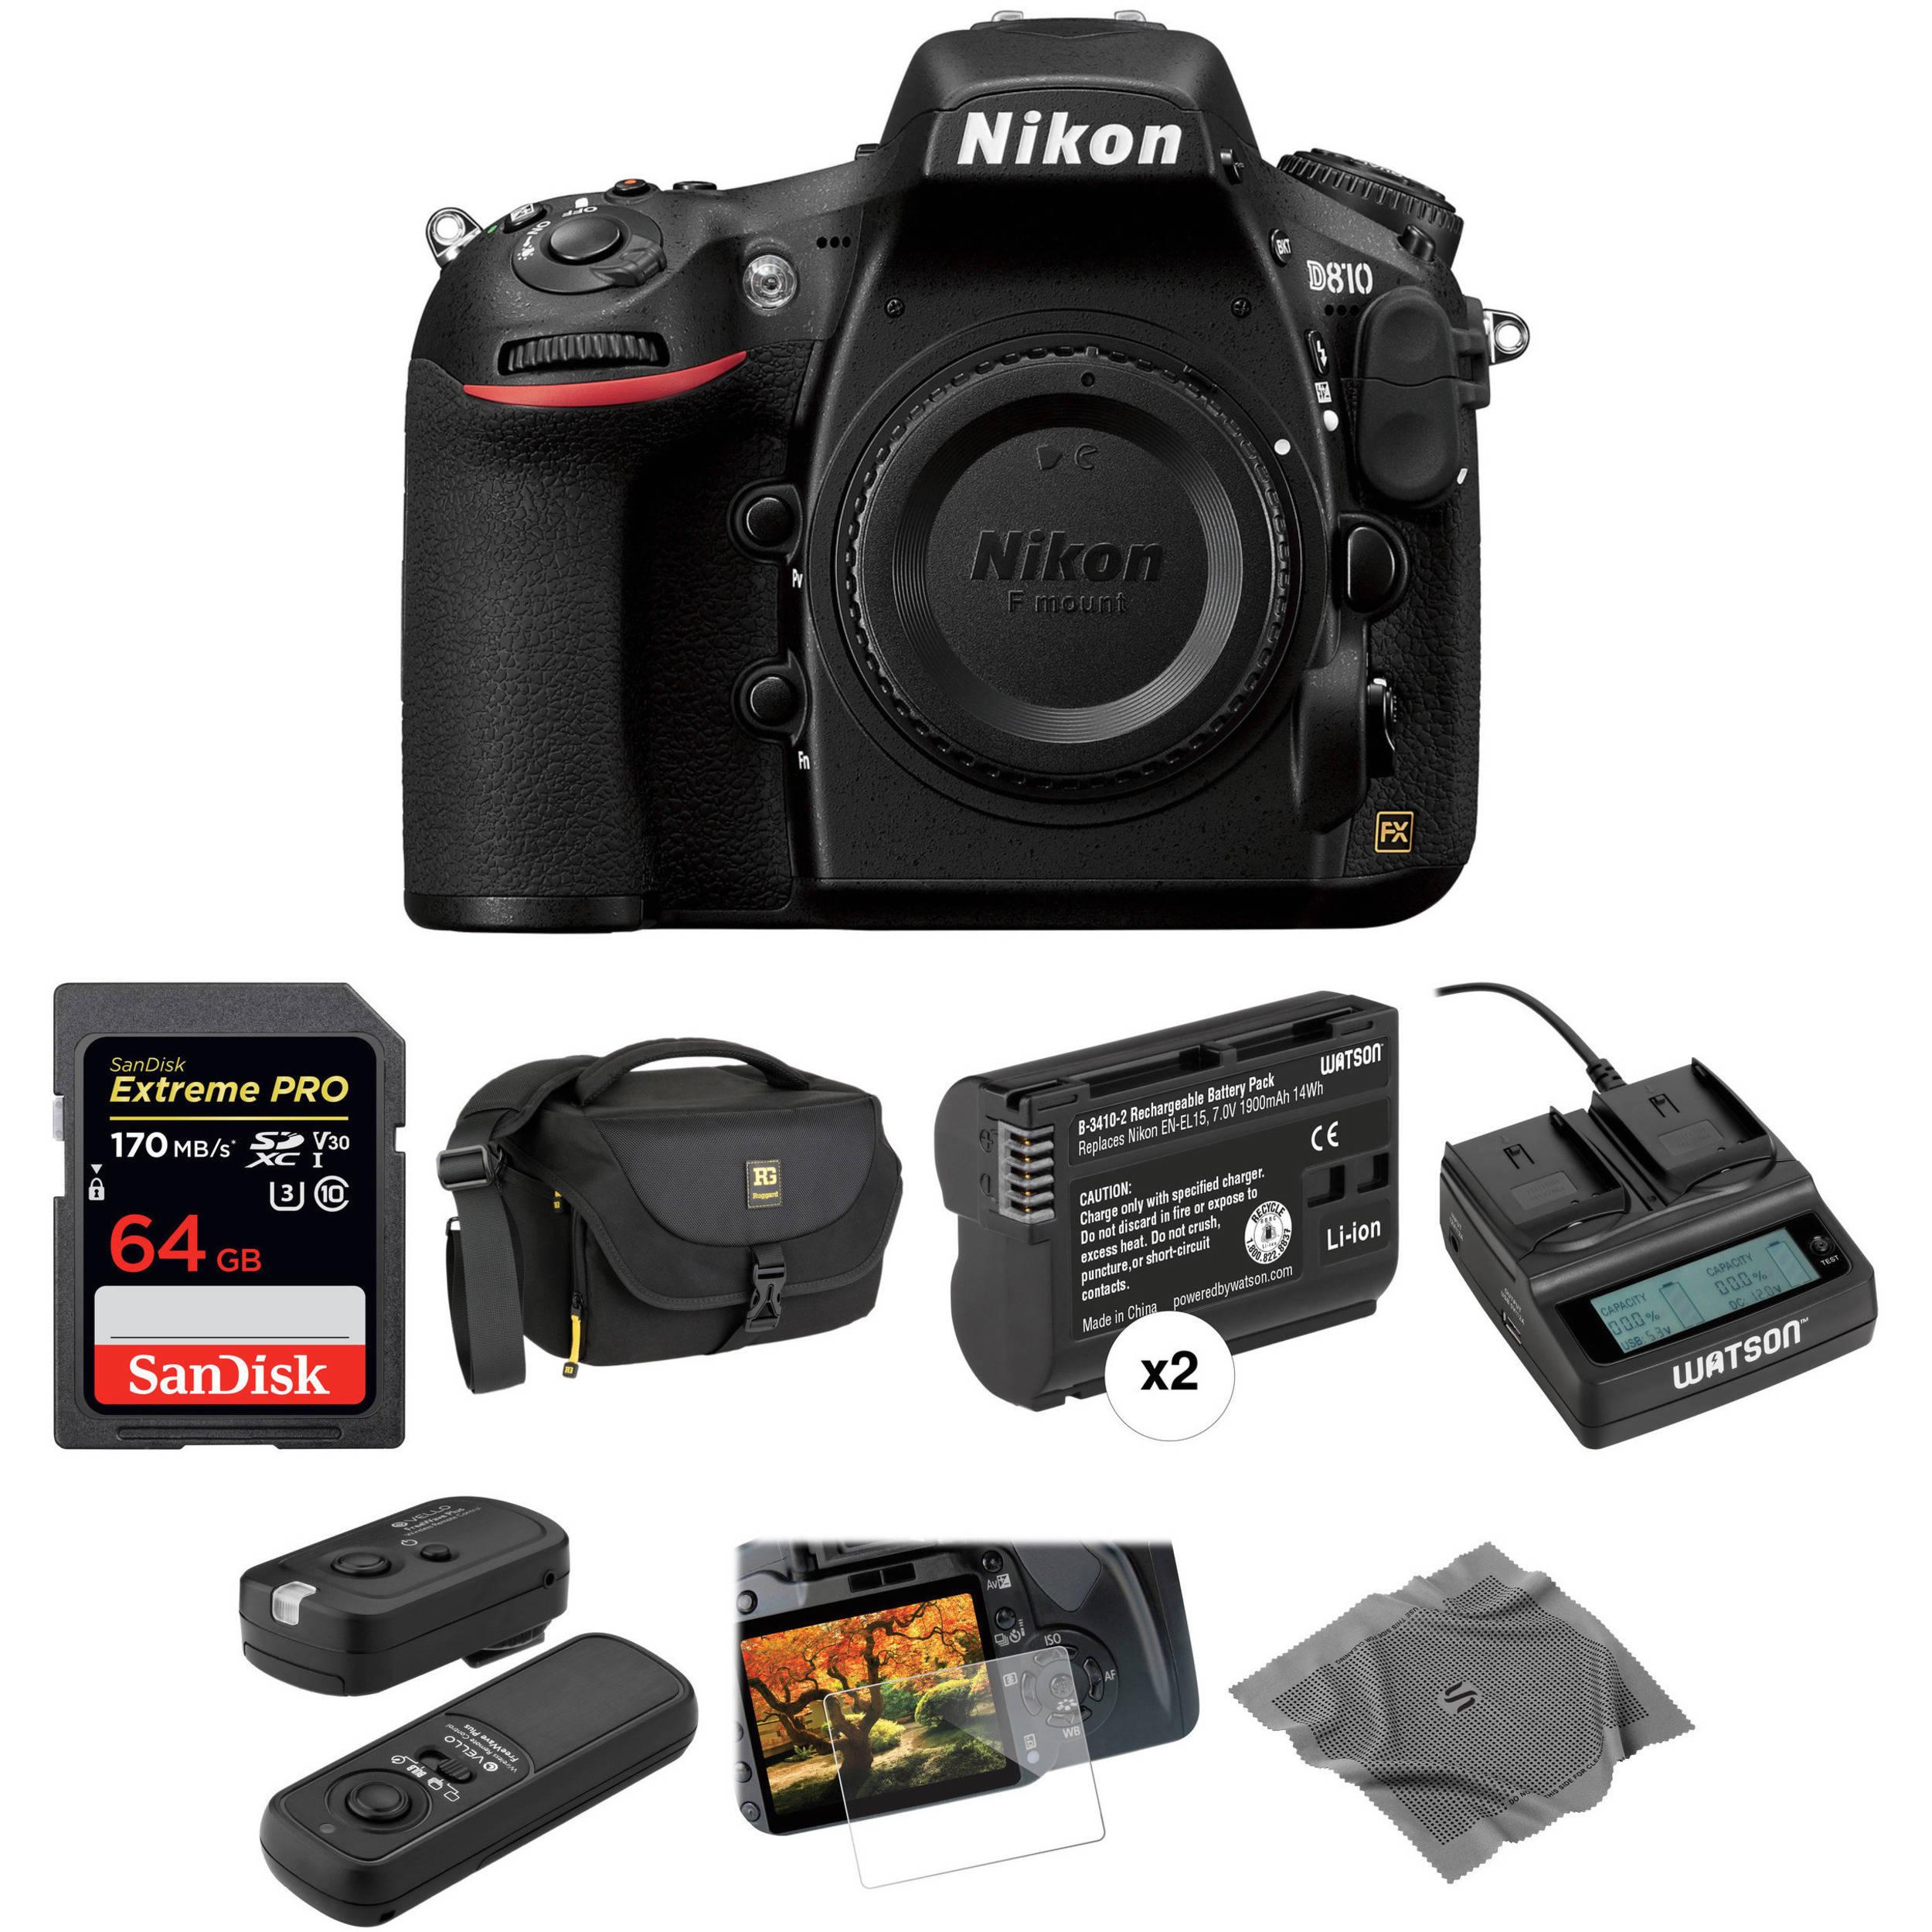 Nikon D810 Dslr Camera Body Deluxe Kit Bh Photo Video Rain Sound Effects Generator Circuit Voice Recorder